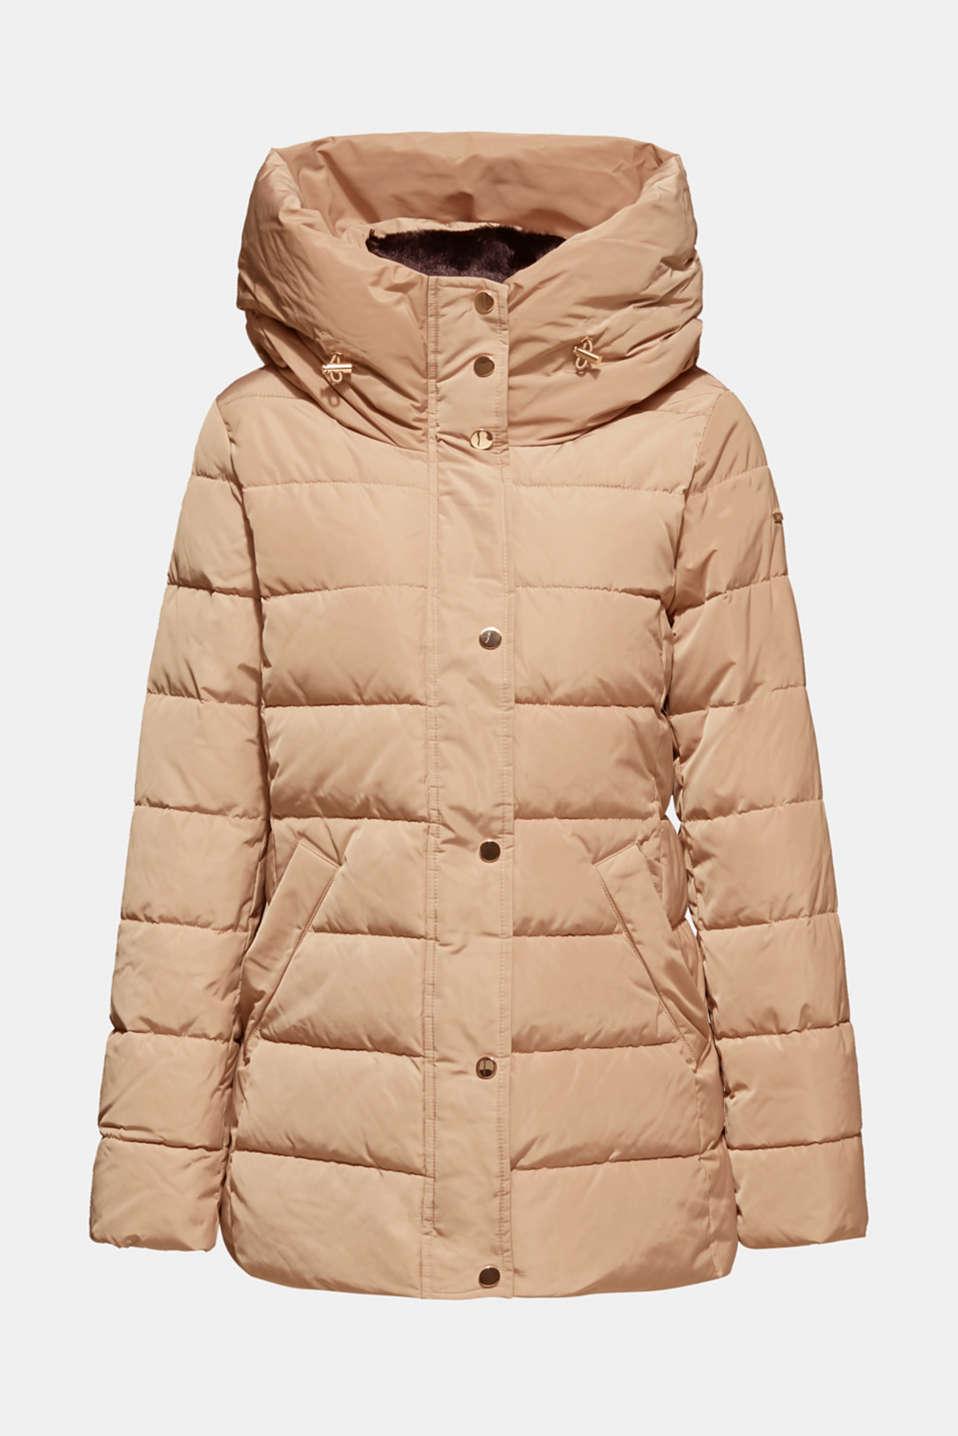 Jackets outdoor woven, SKIN BEIGE, detail image number 6